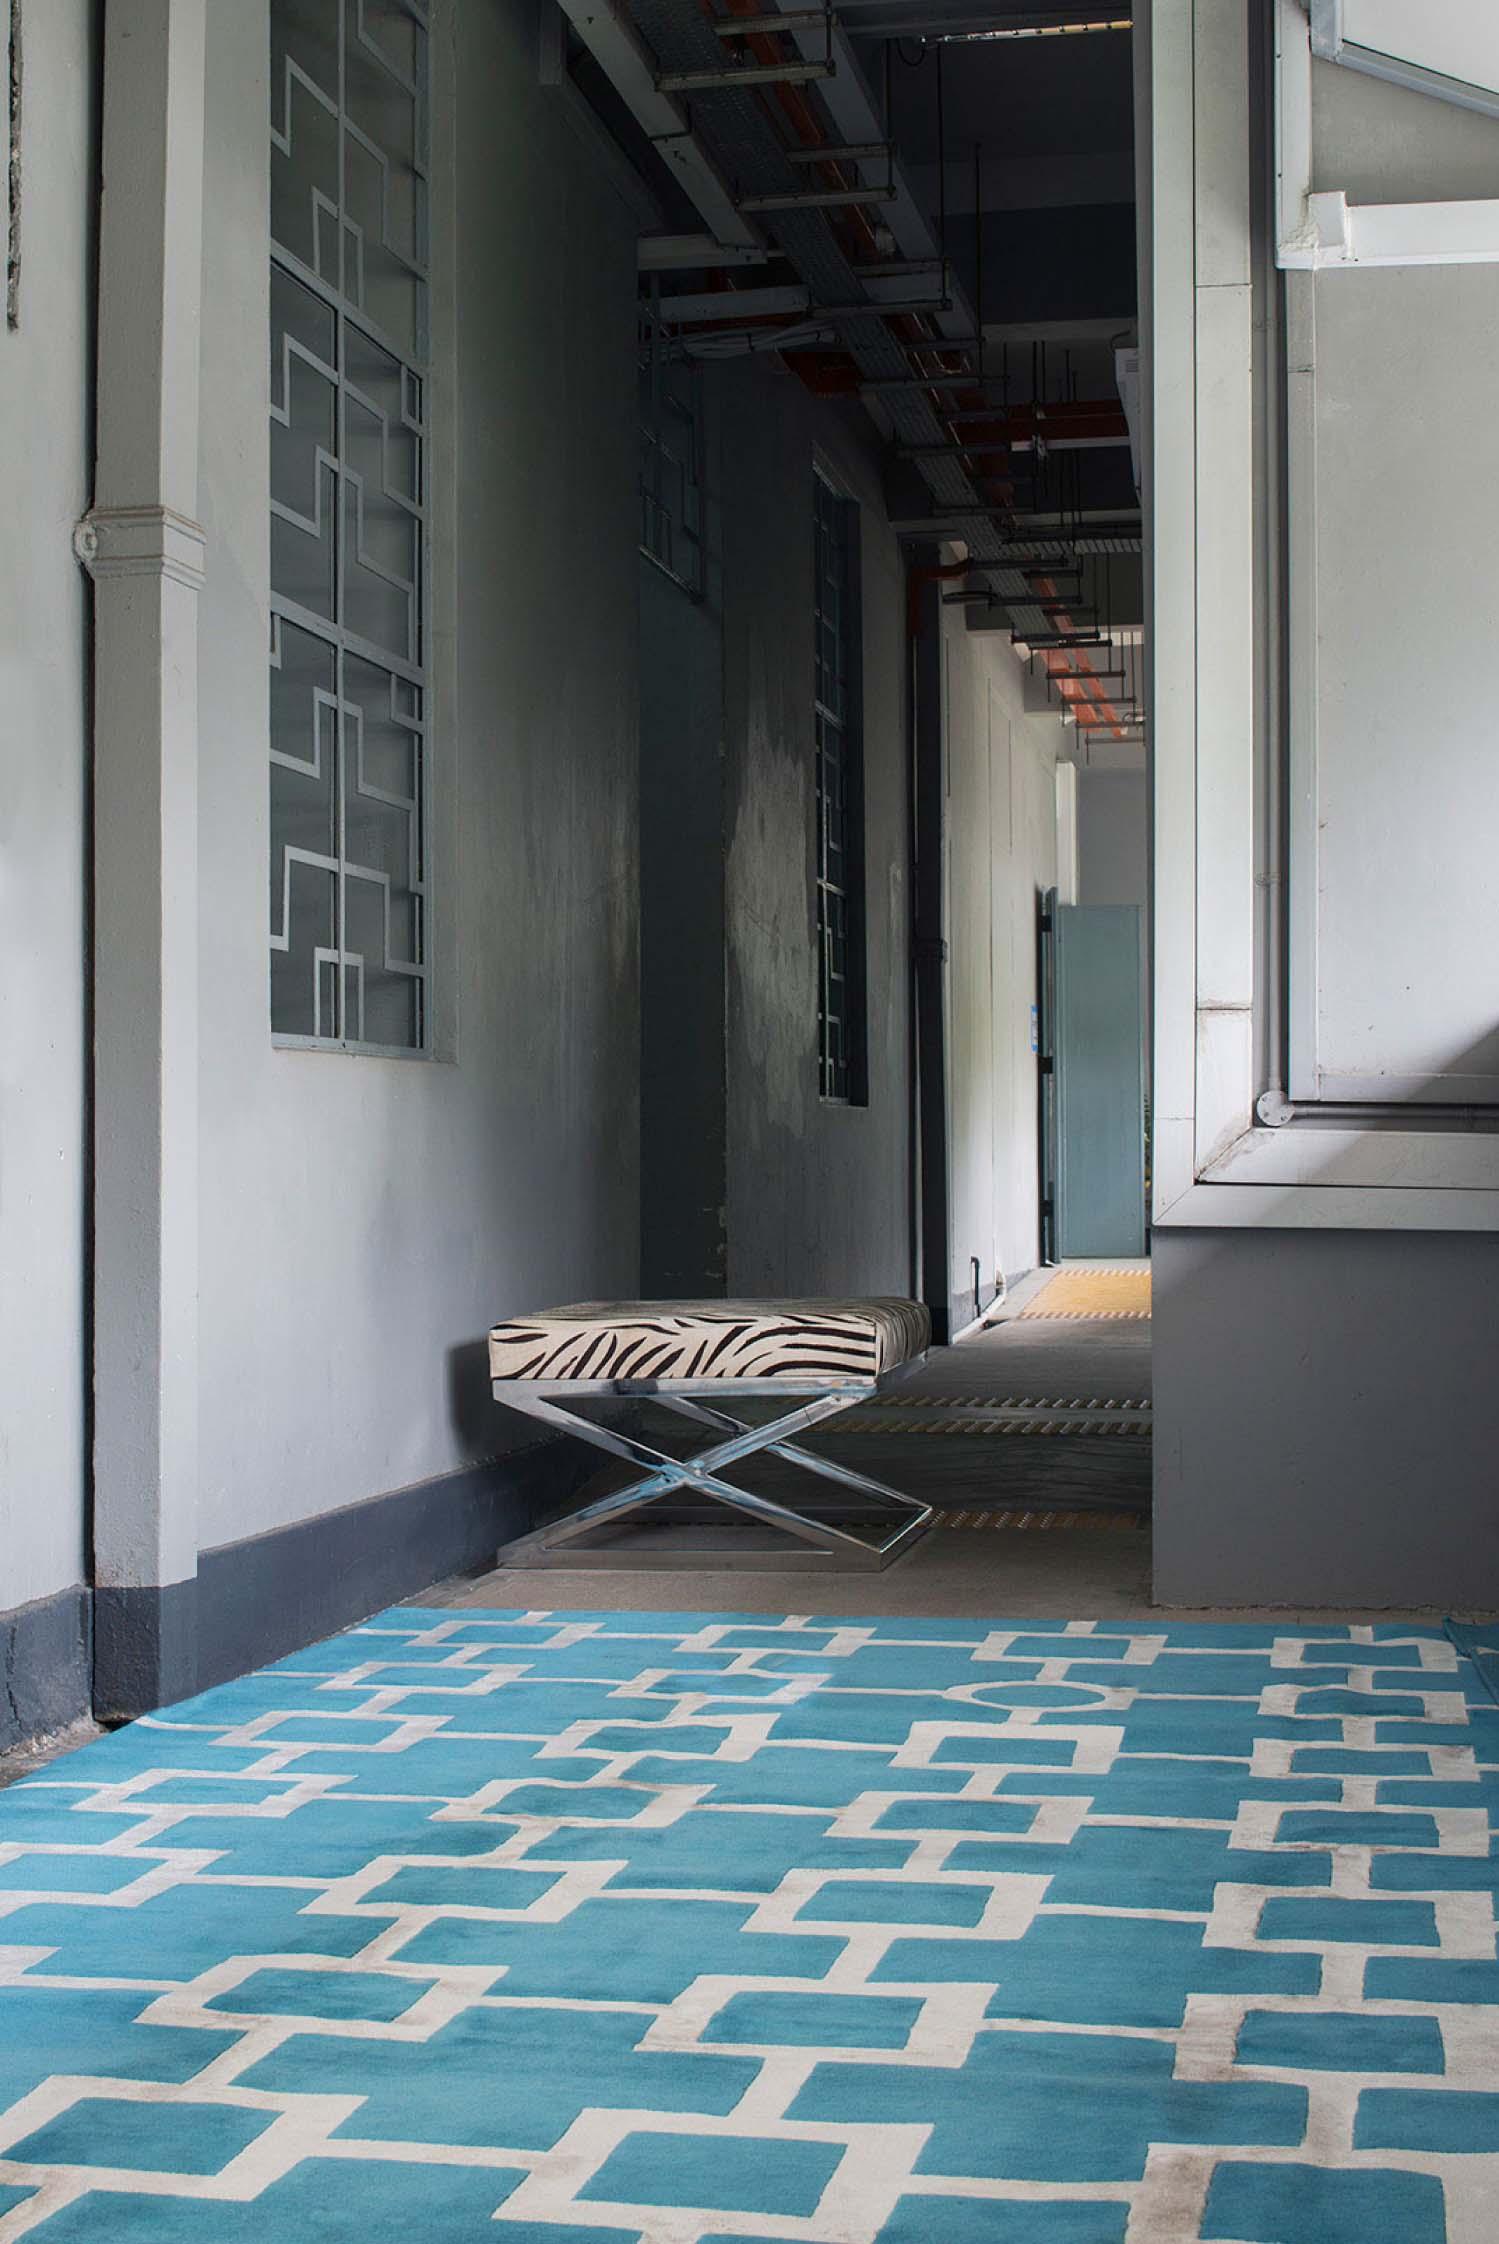 Red carpet square blue